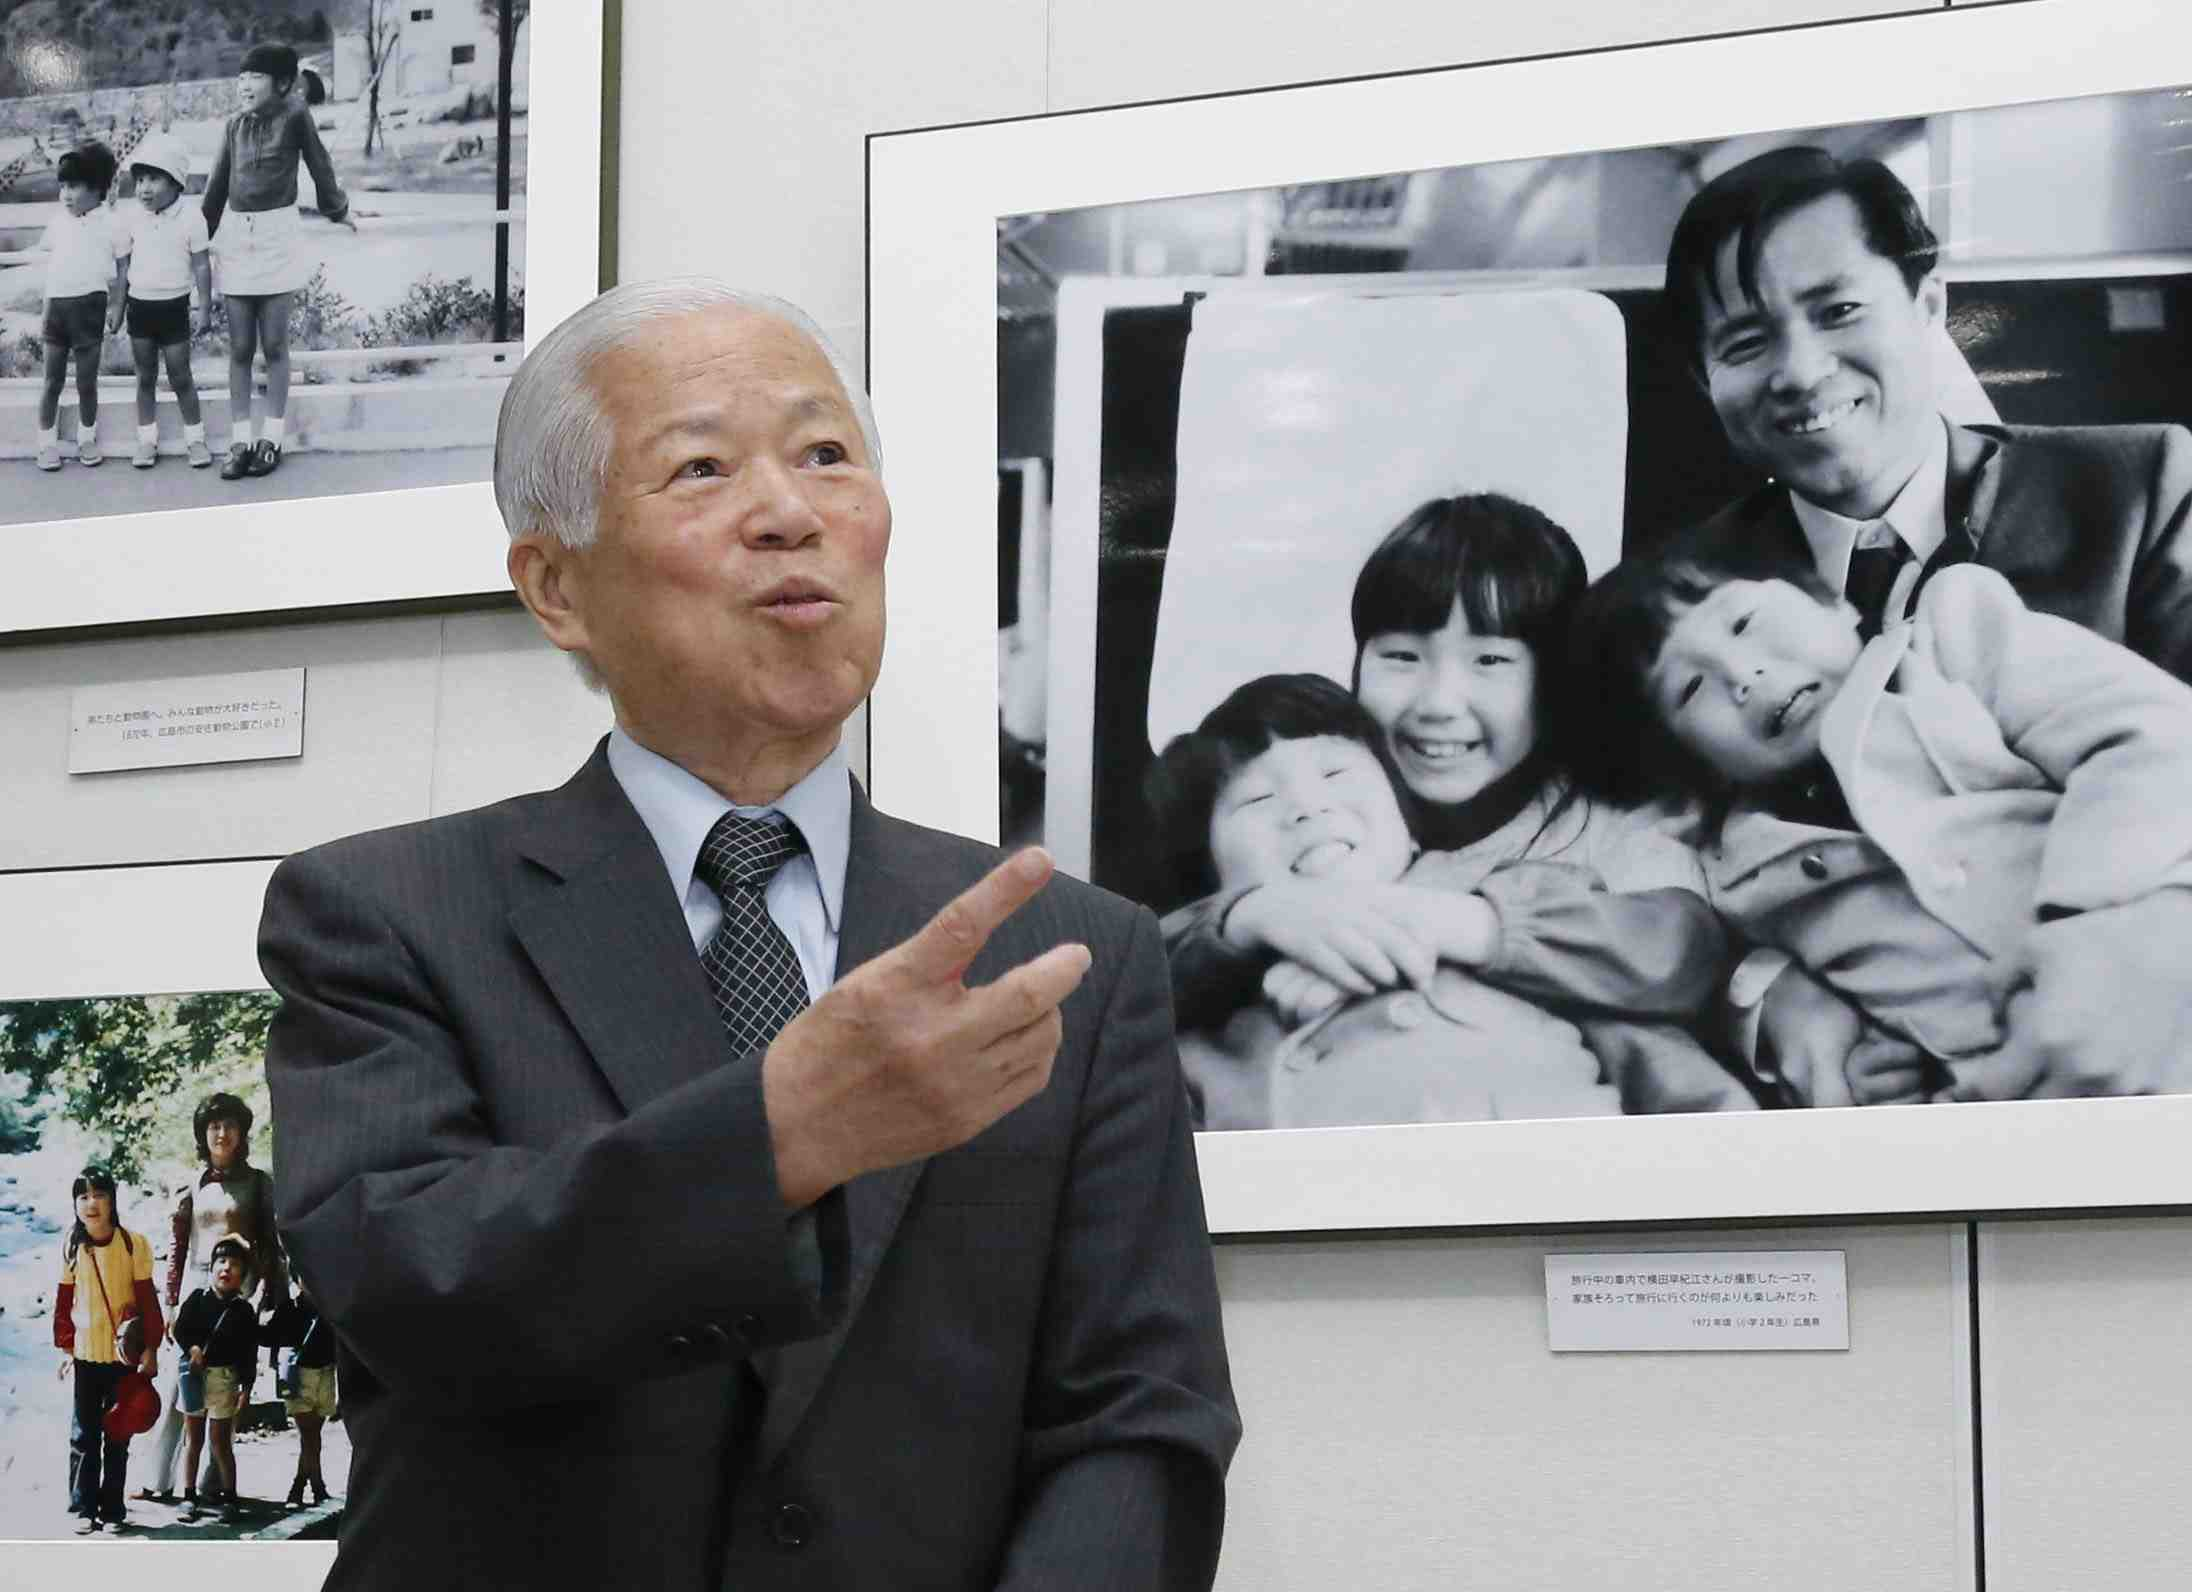 Obituary Shigeru Yokota North Korea Abduction 015